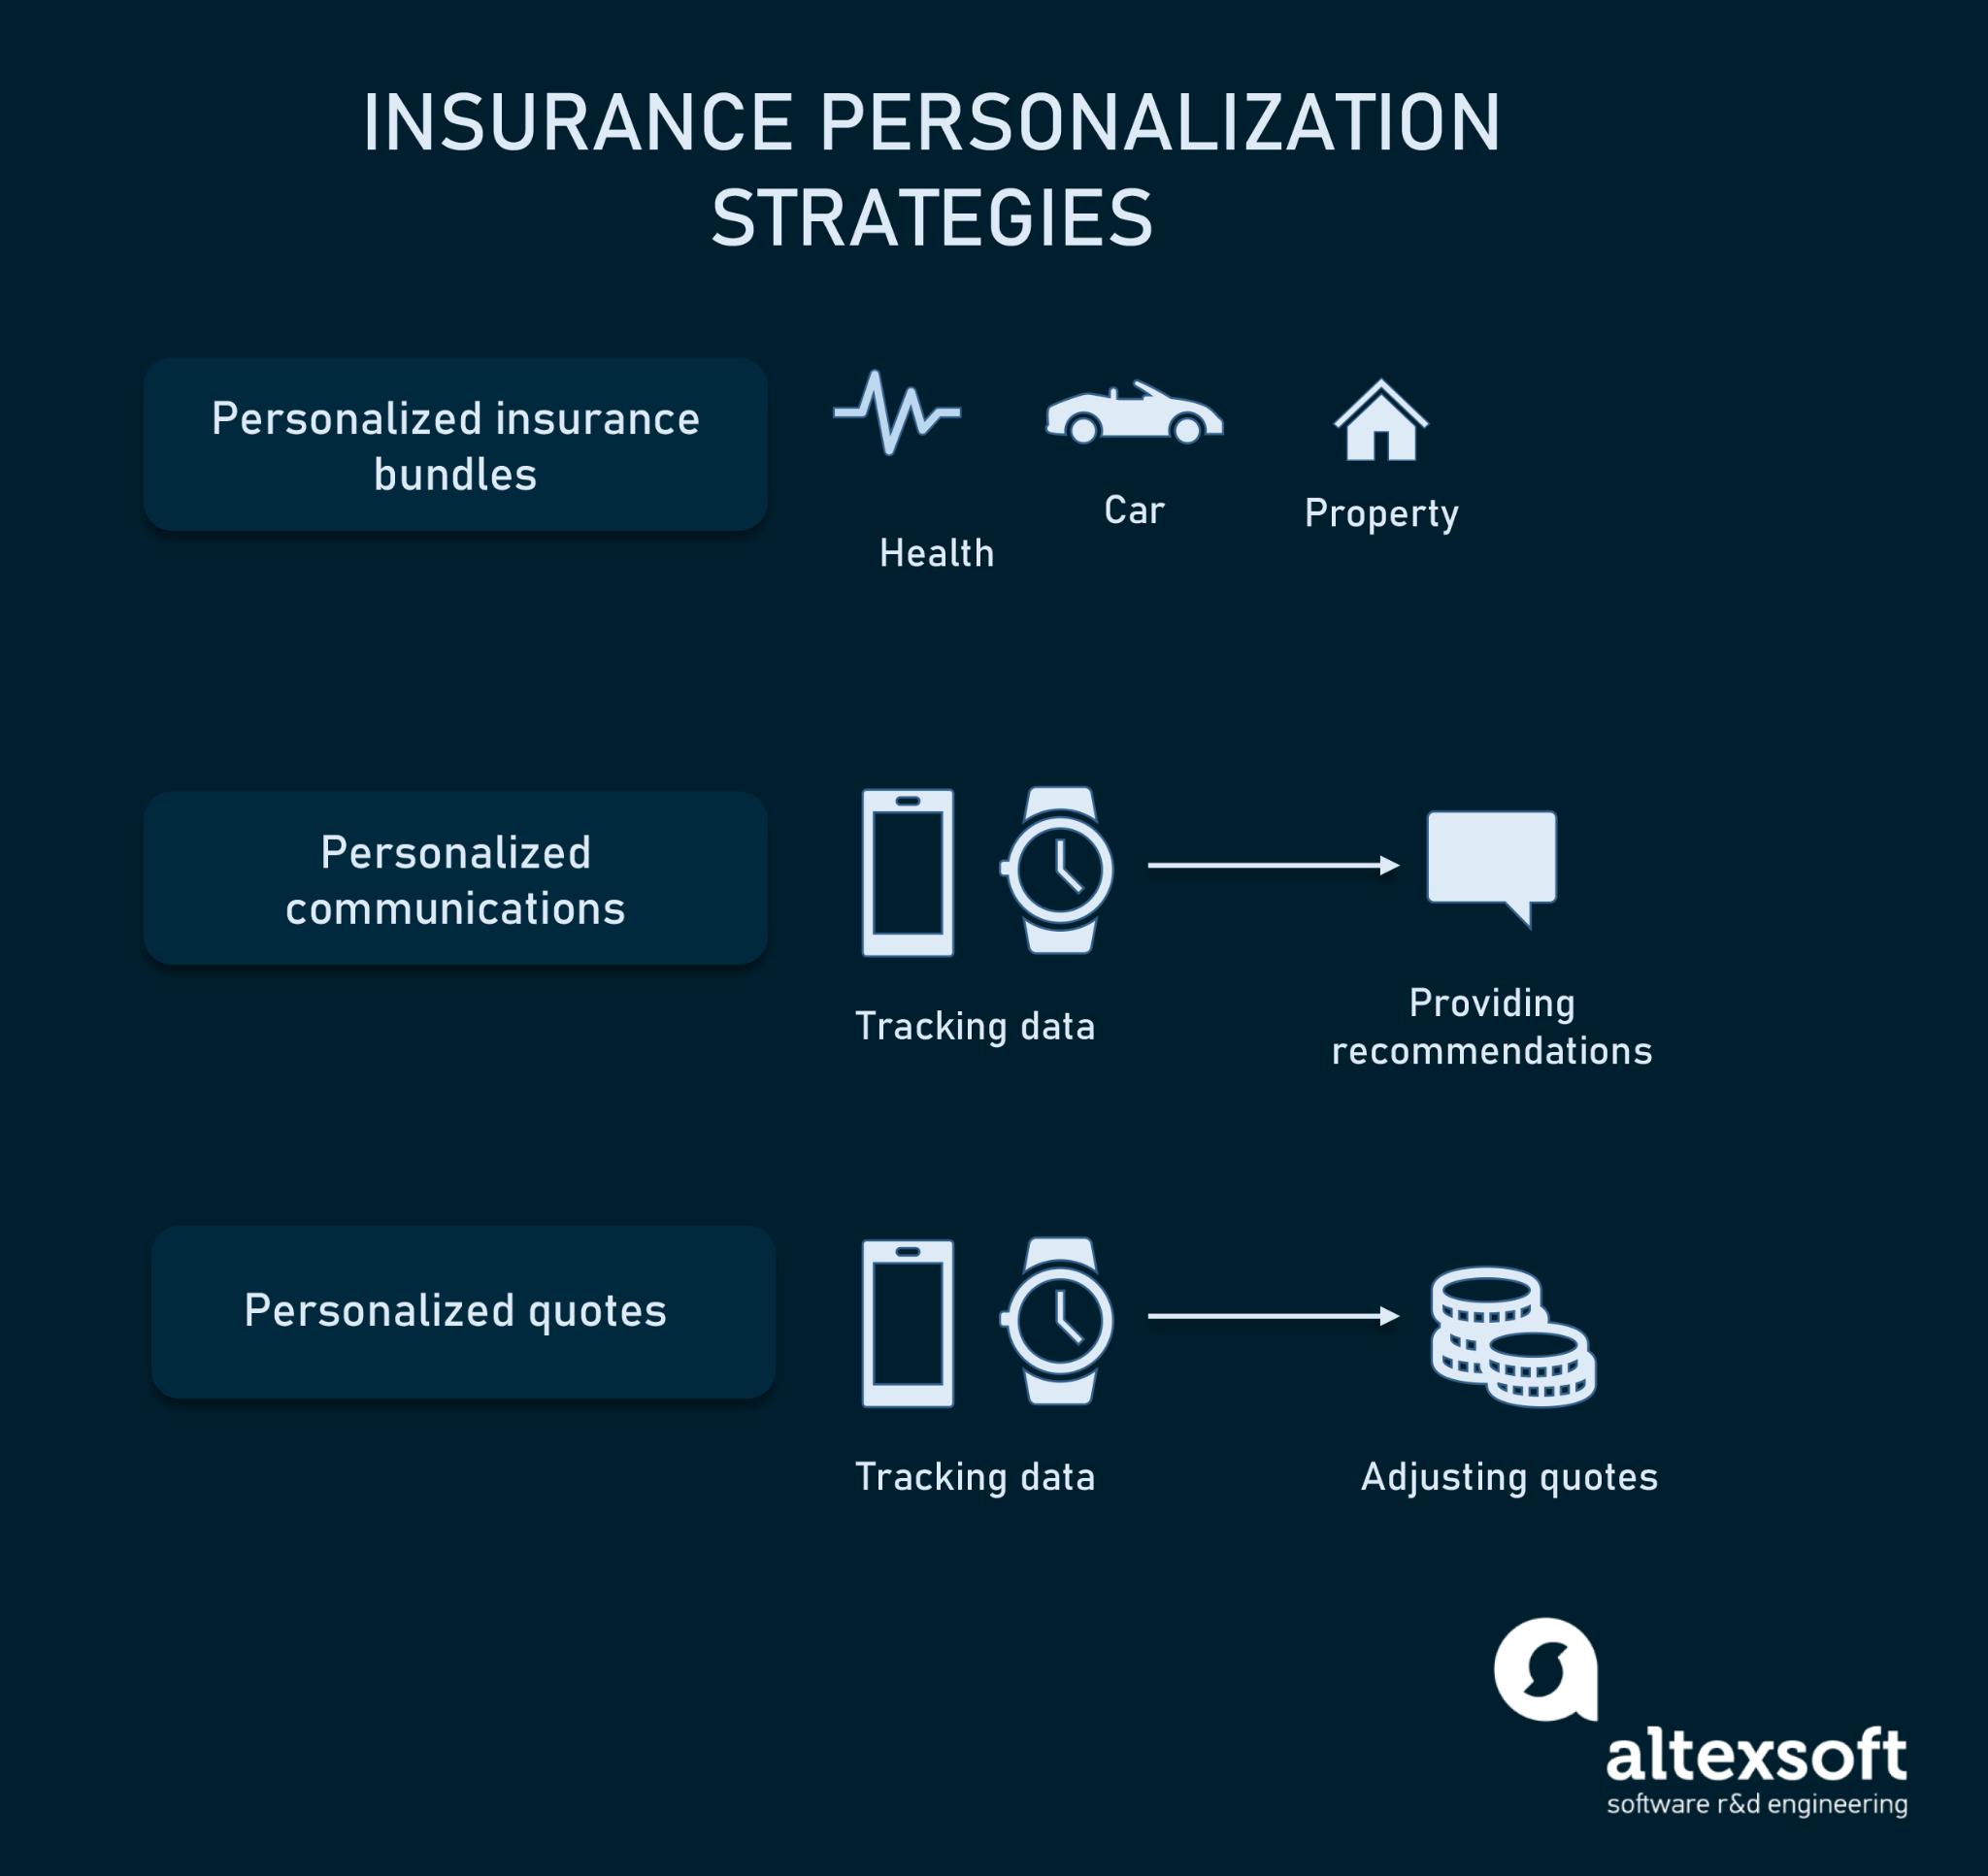 Key insurance personalization strategies